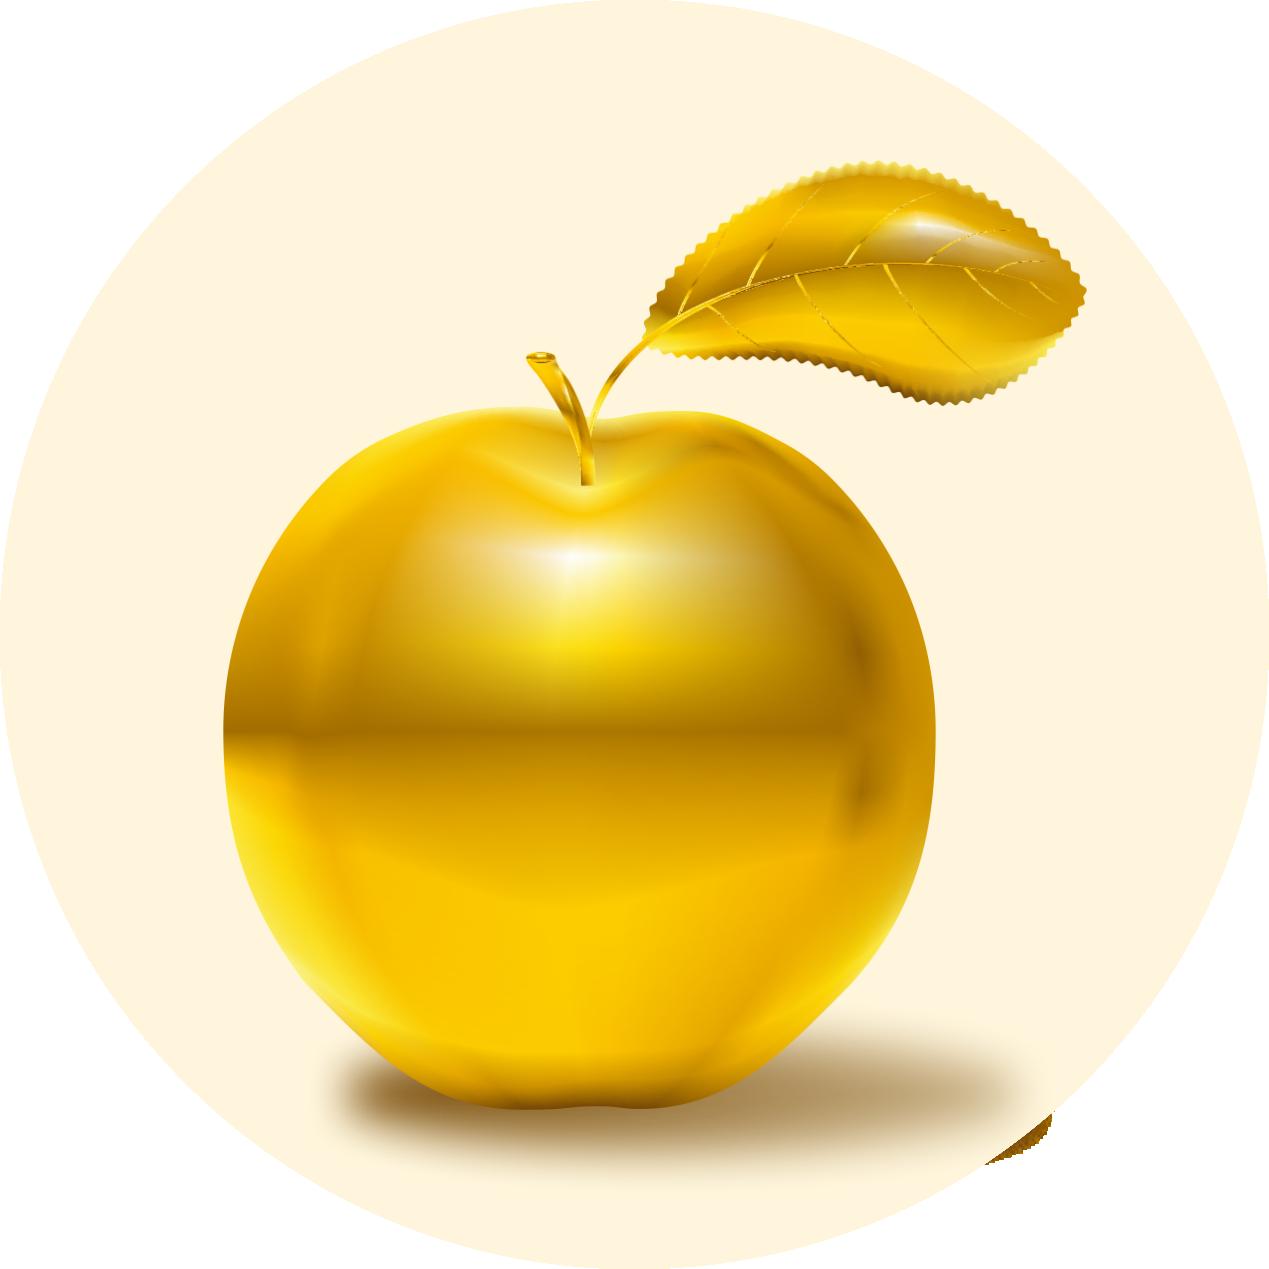 Картинки, золотые яблоки картинки